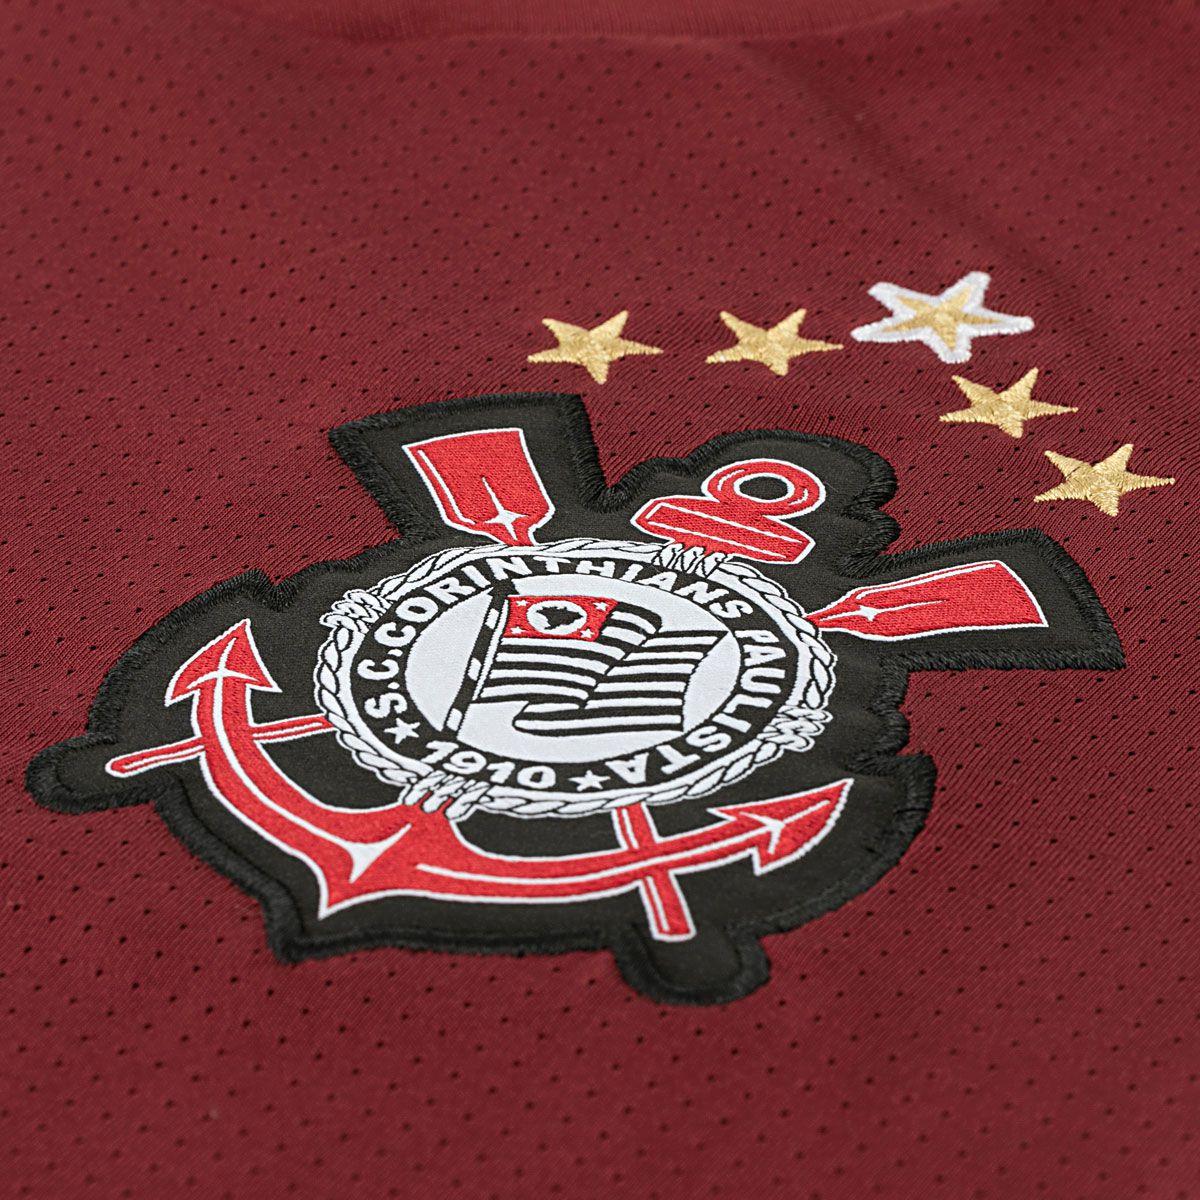 Camiseta Corinthians 2011 Grená Masculina